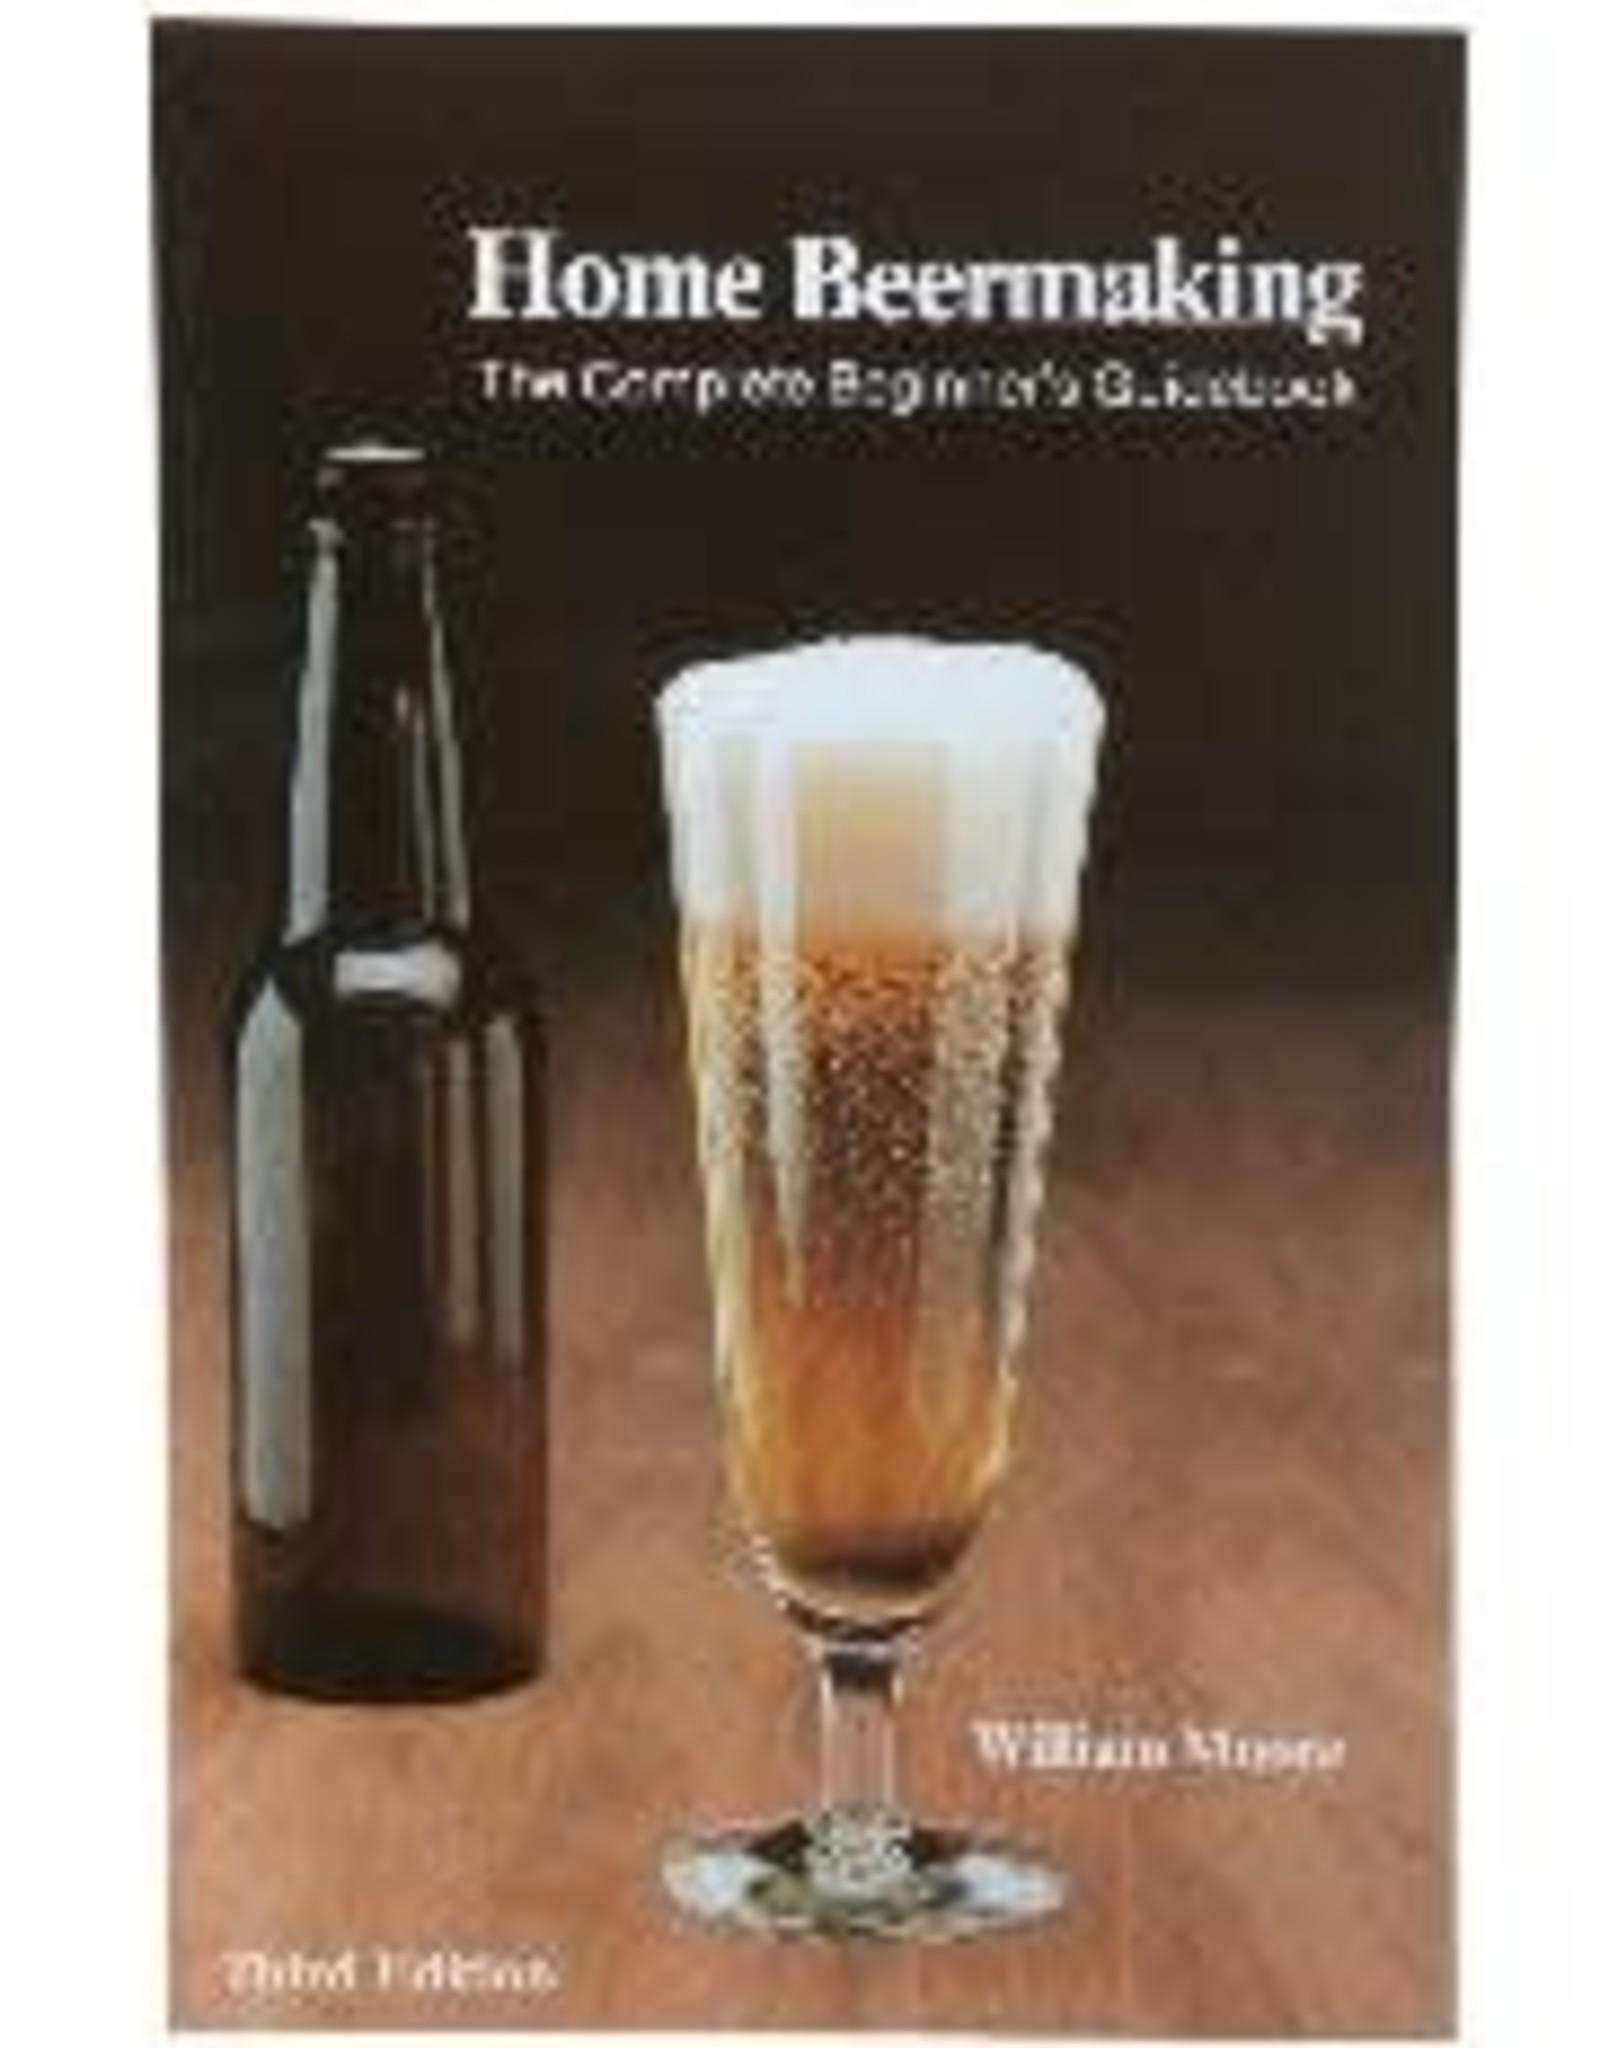 HOME BEERMAKING